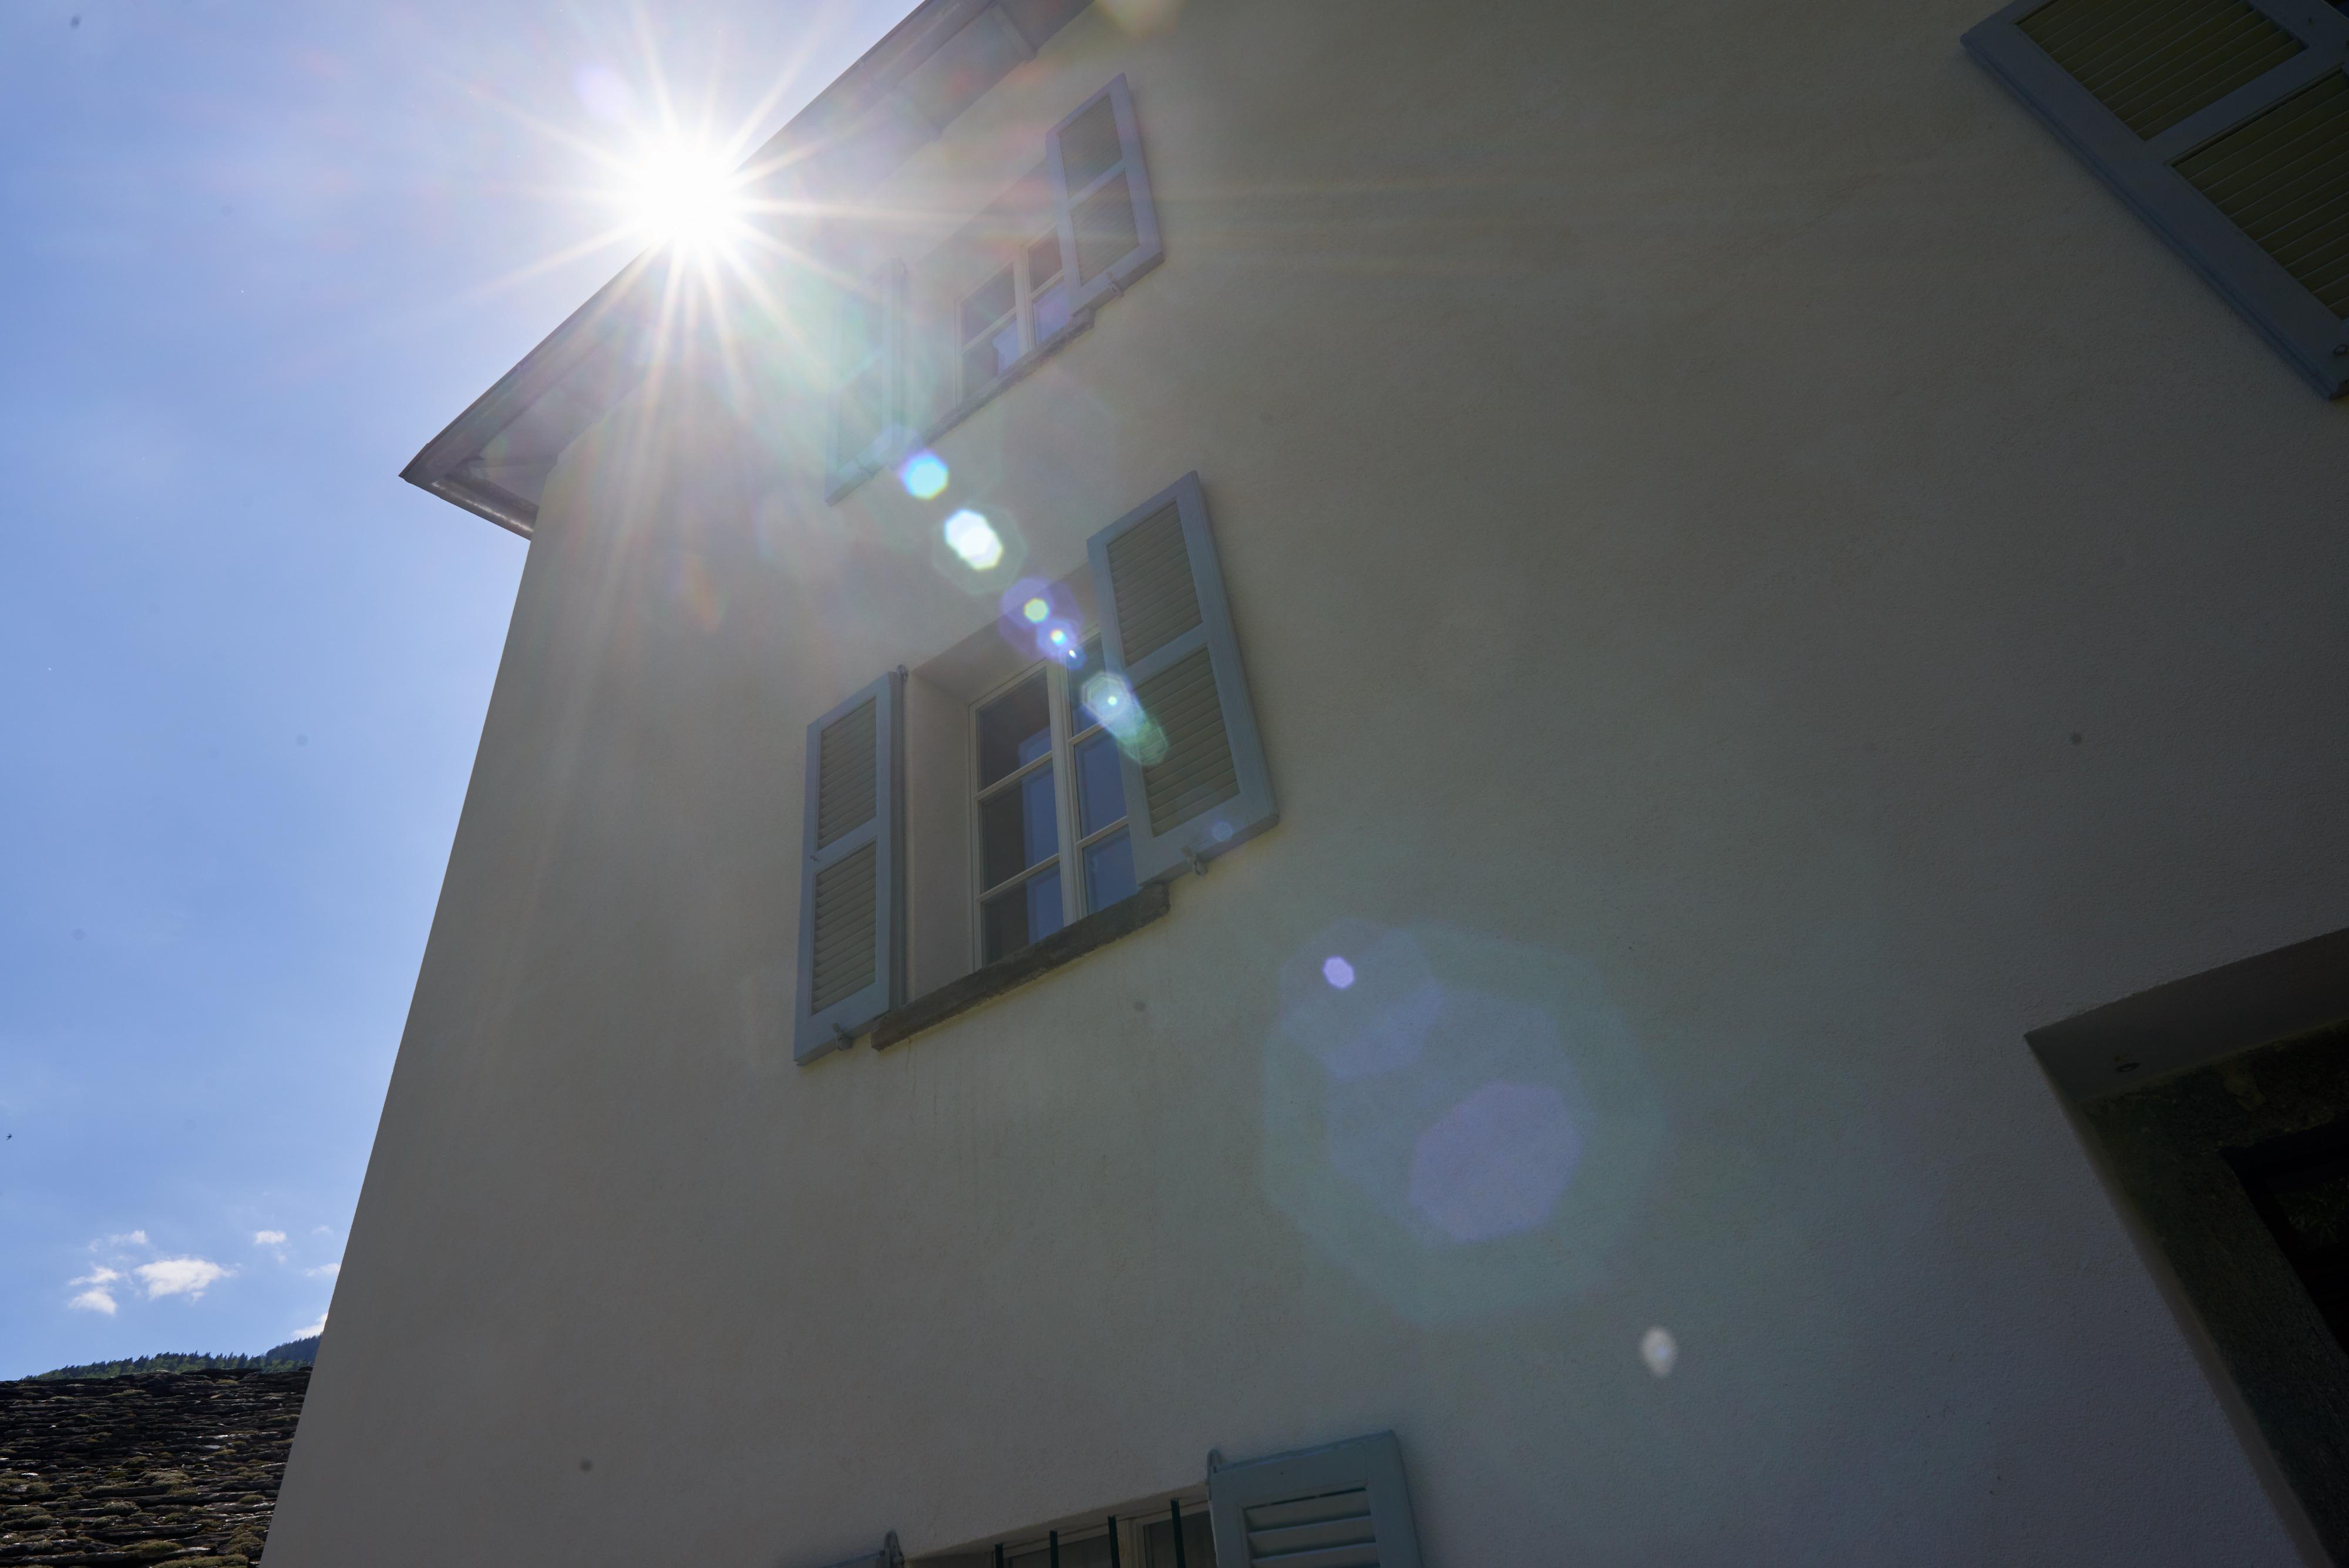 ferienhaus-soazza_DSC_4691